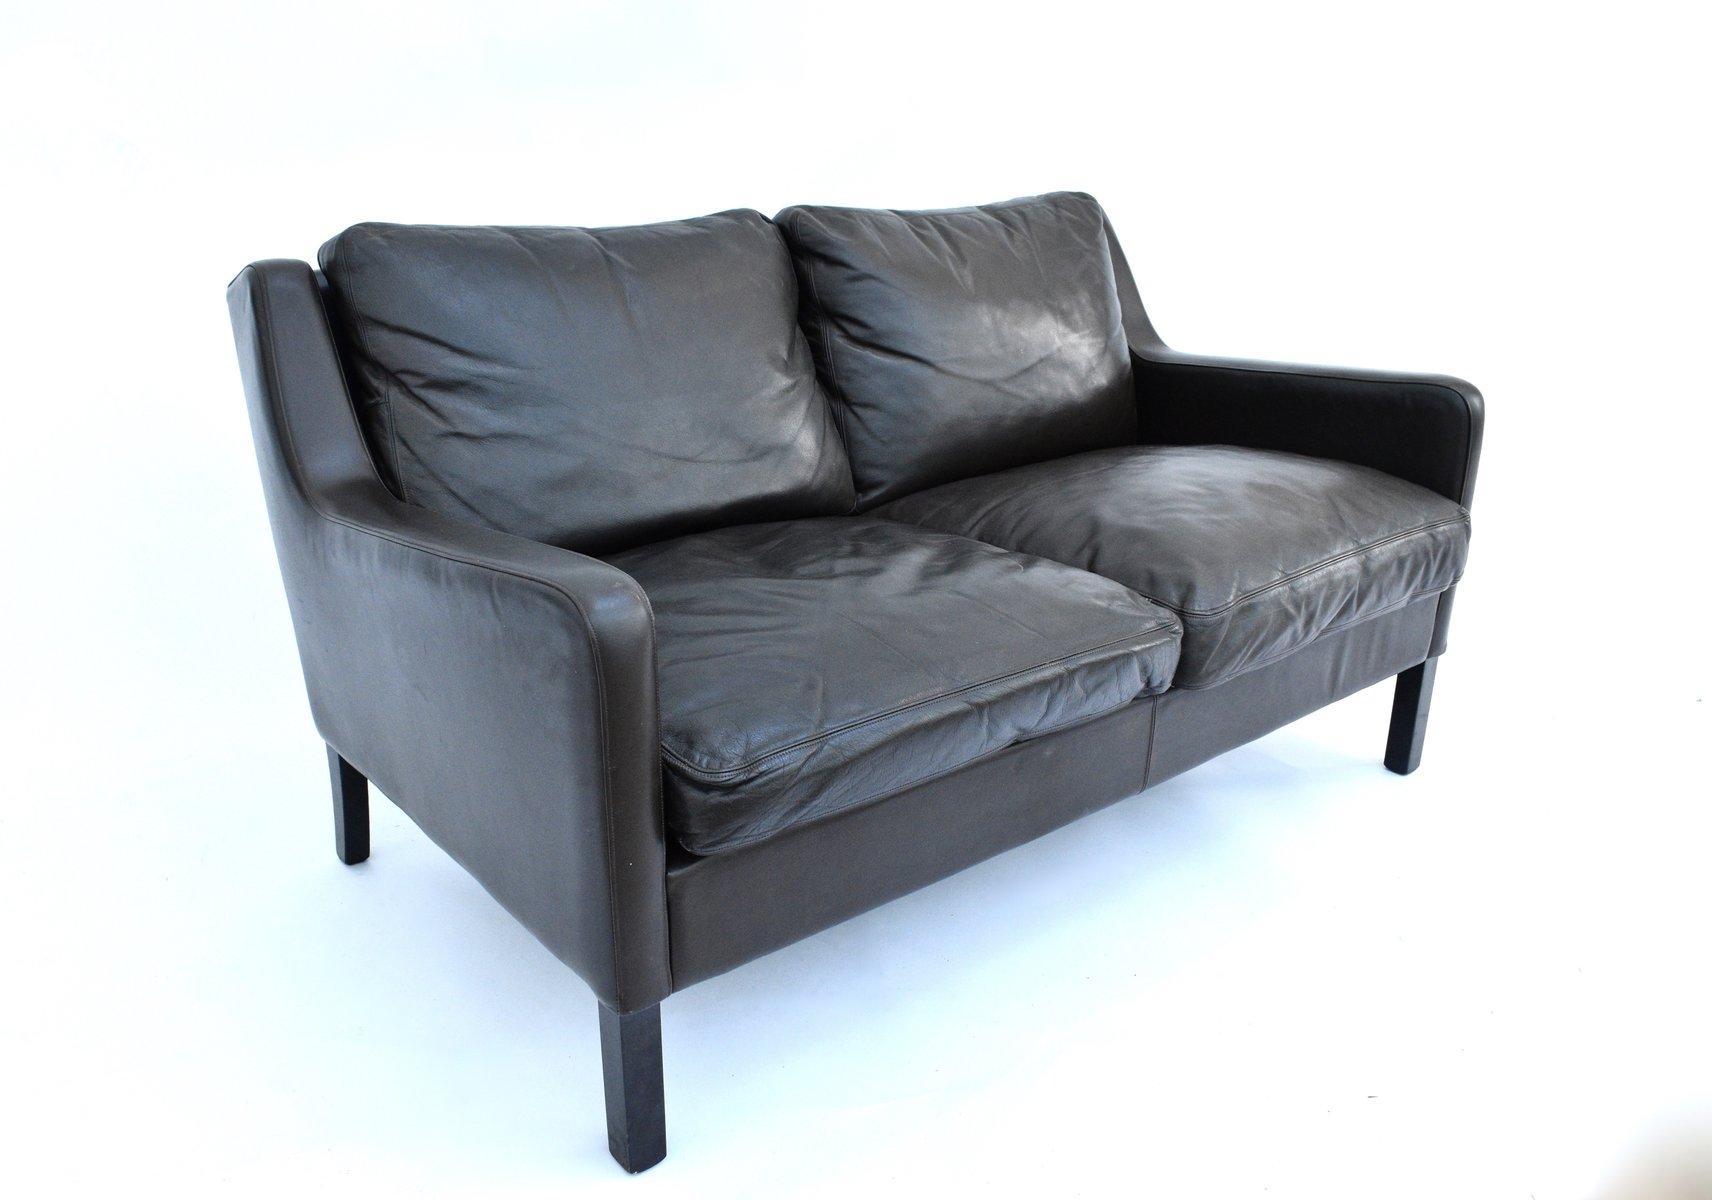 Danish Dark Brown Leather 2 Seater Sofa From Thams Kvalitet 1960s